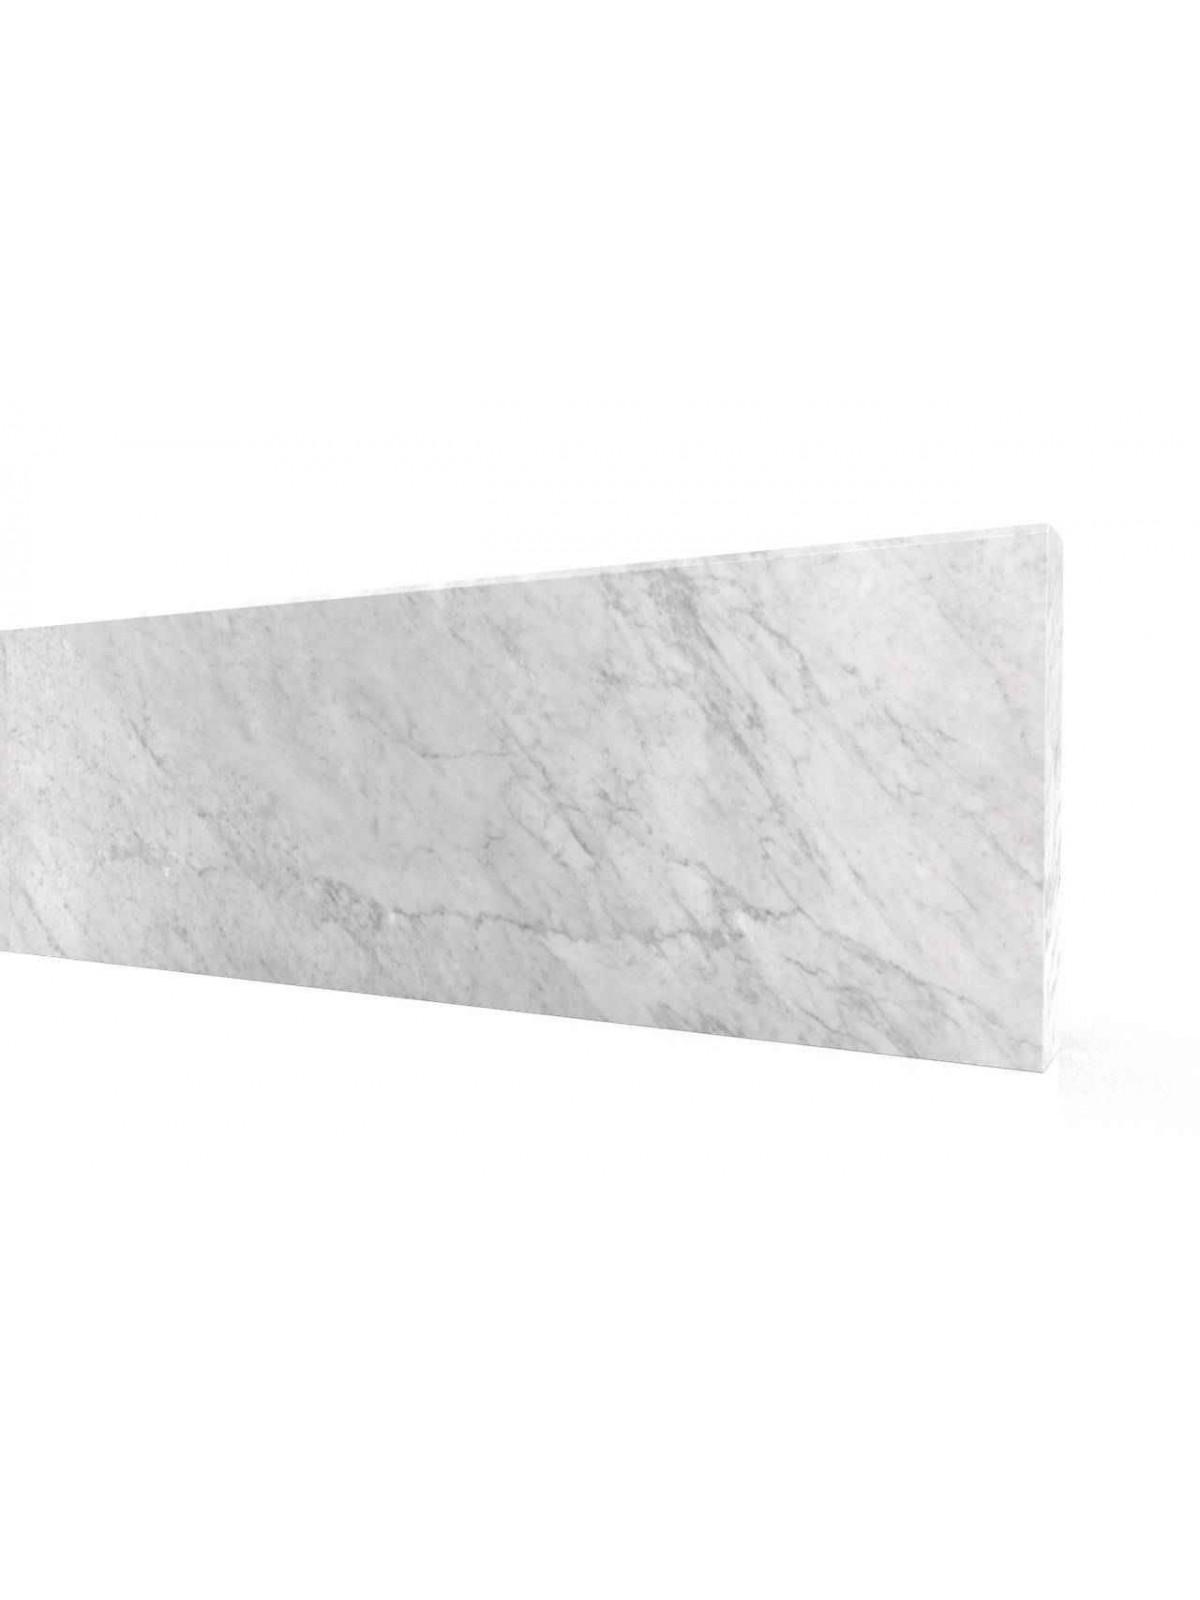 Aufsatz aus Bianco di Carrara